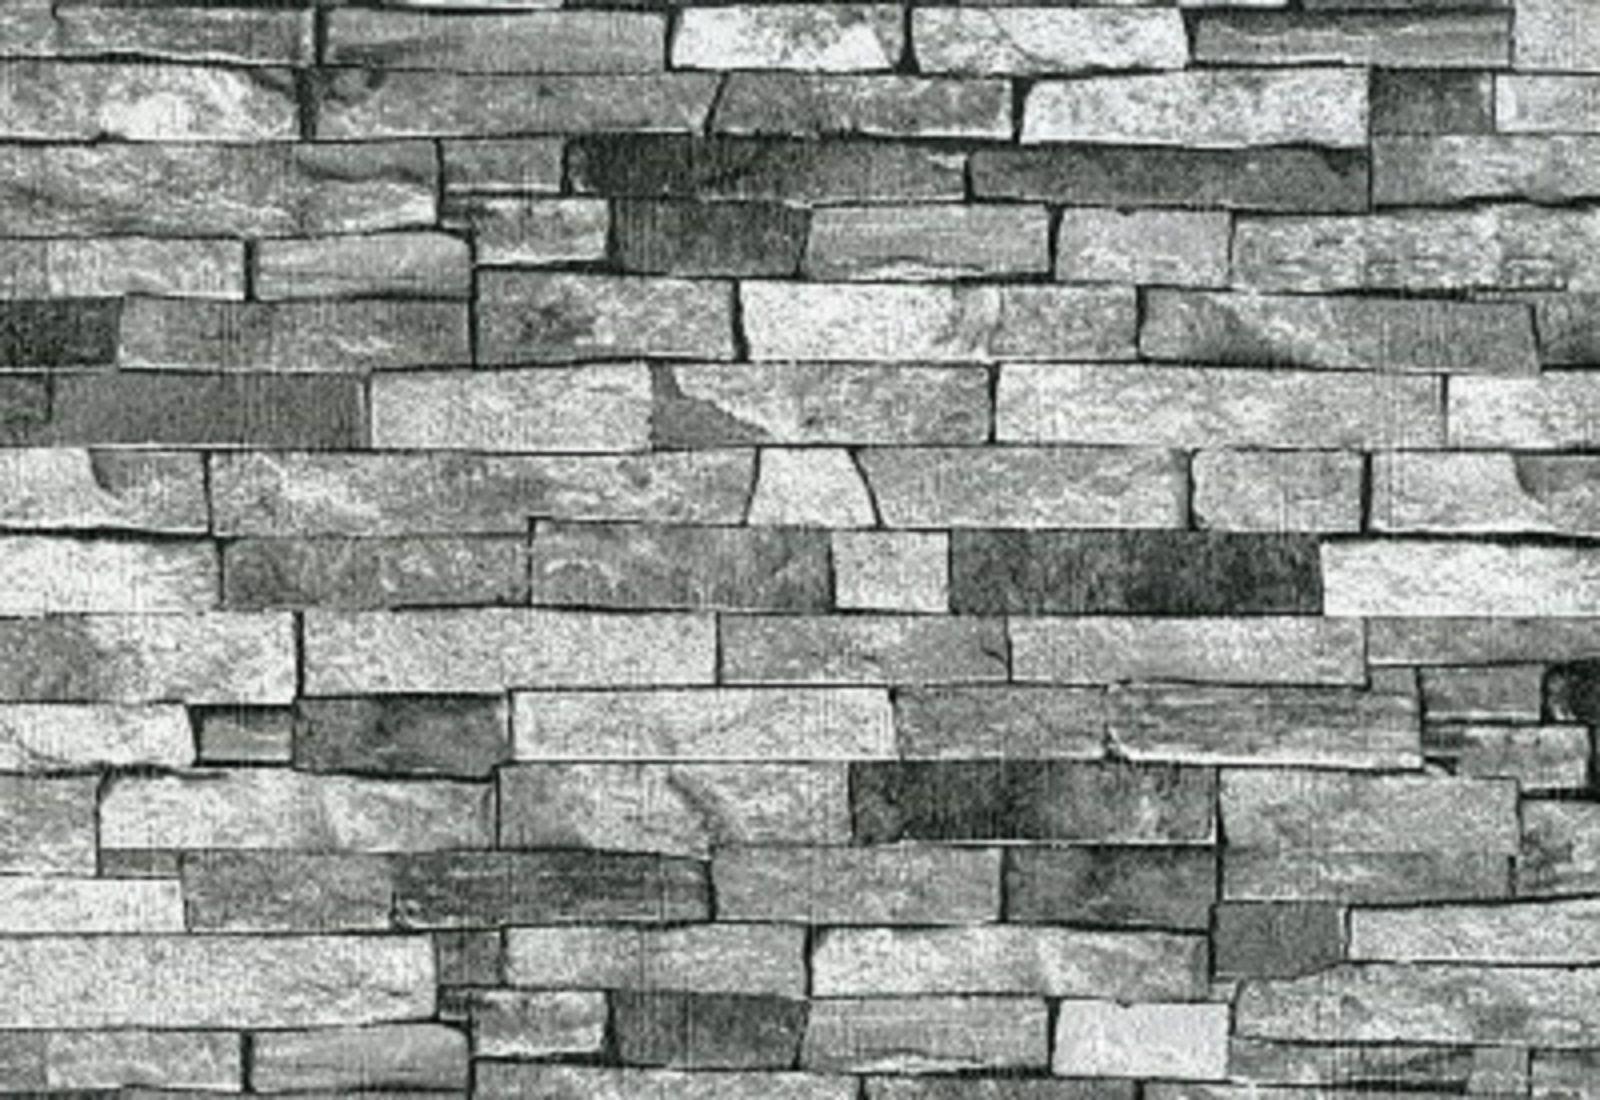 P&S Textured Brick Effect Wallpaper Charcoal Grey Black ...